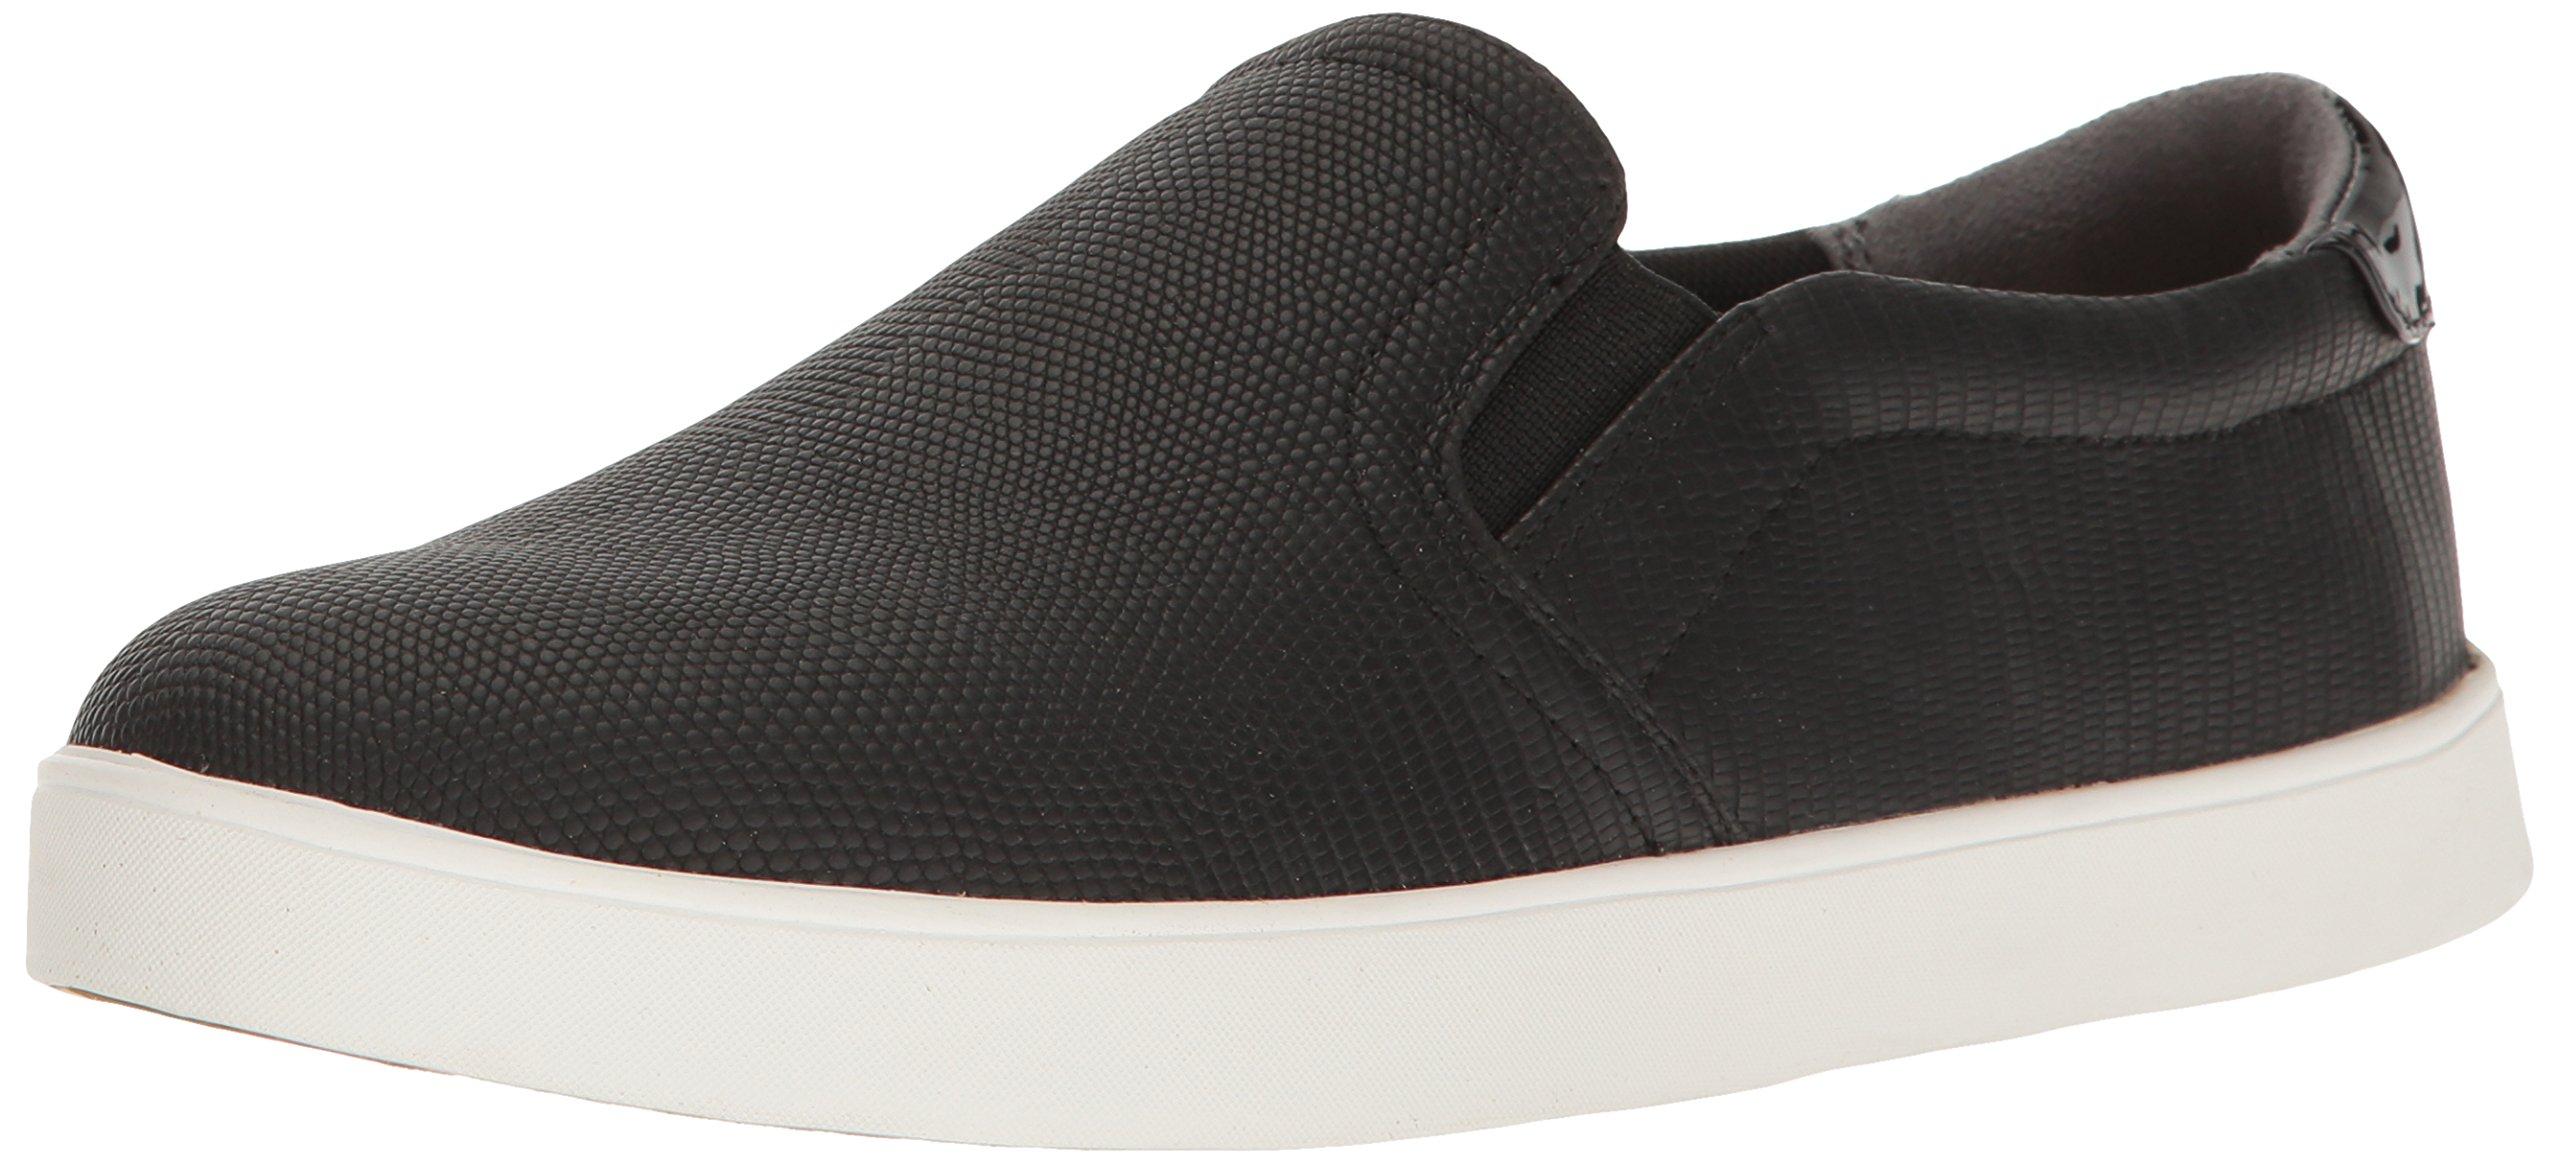 Dr. Scholl's Shoes Women's Madison Fashion Sneaker, Black Lizard Print, 8 M US by Dr. Scholl's Shoes